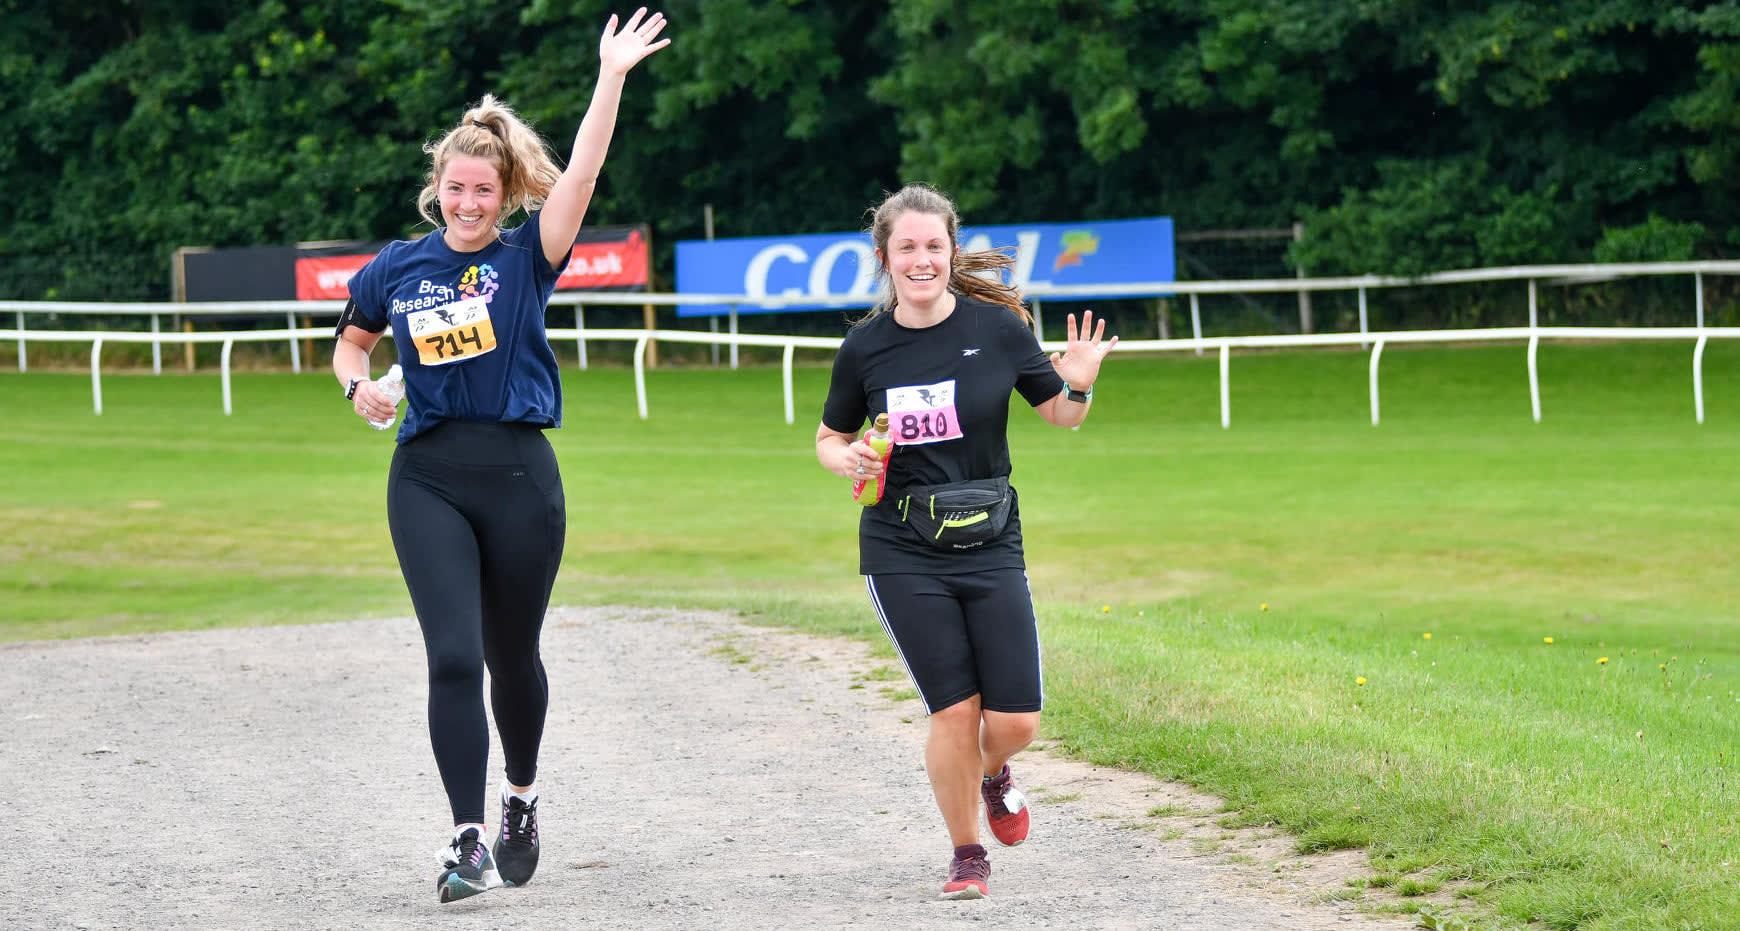 Chepstow Racecourse 5k, 10k & Half Marathon - July